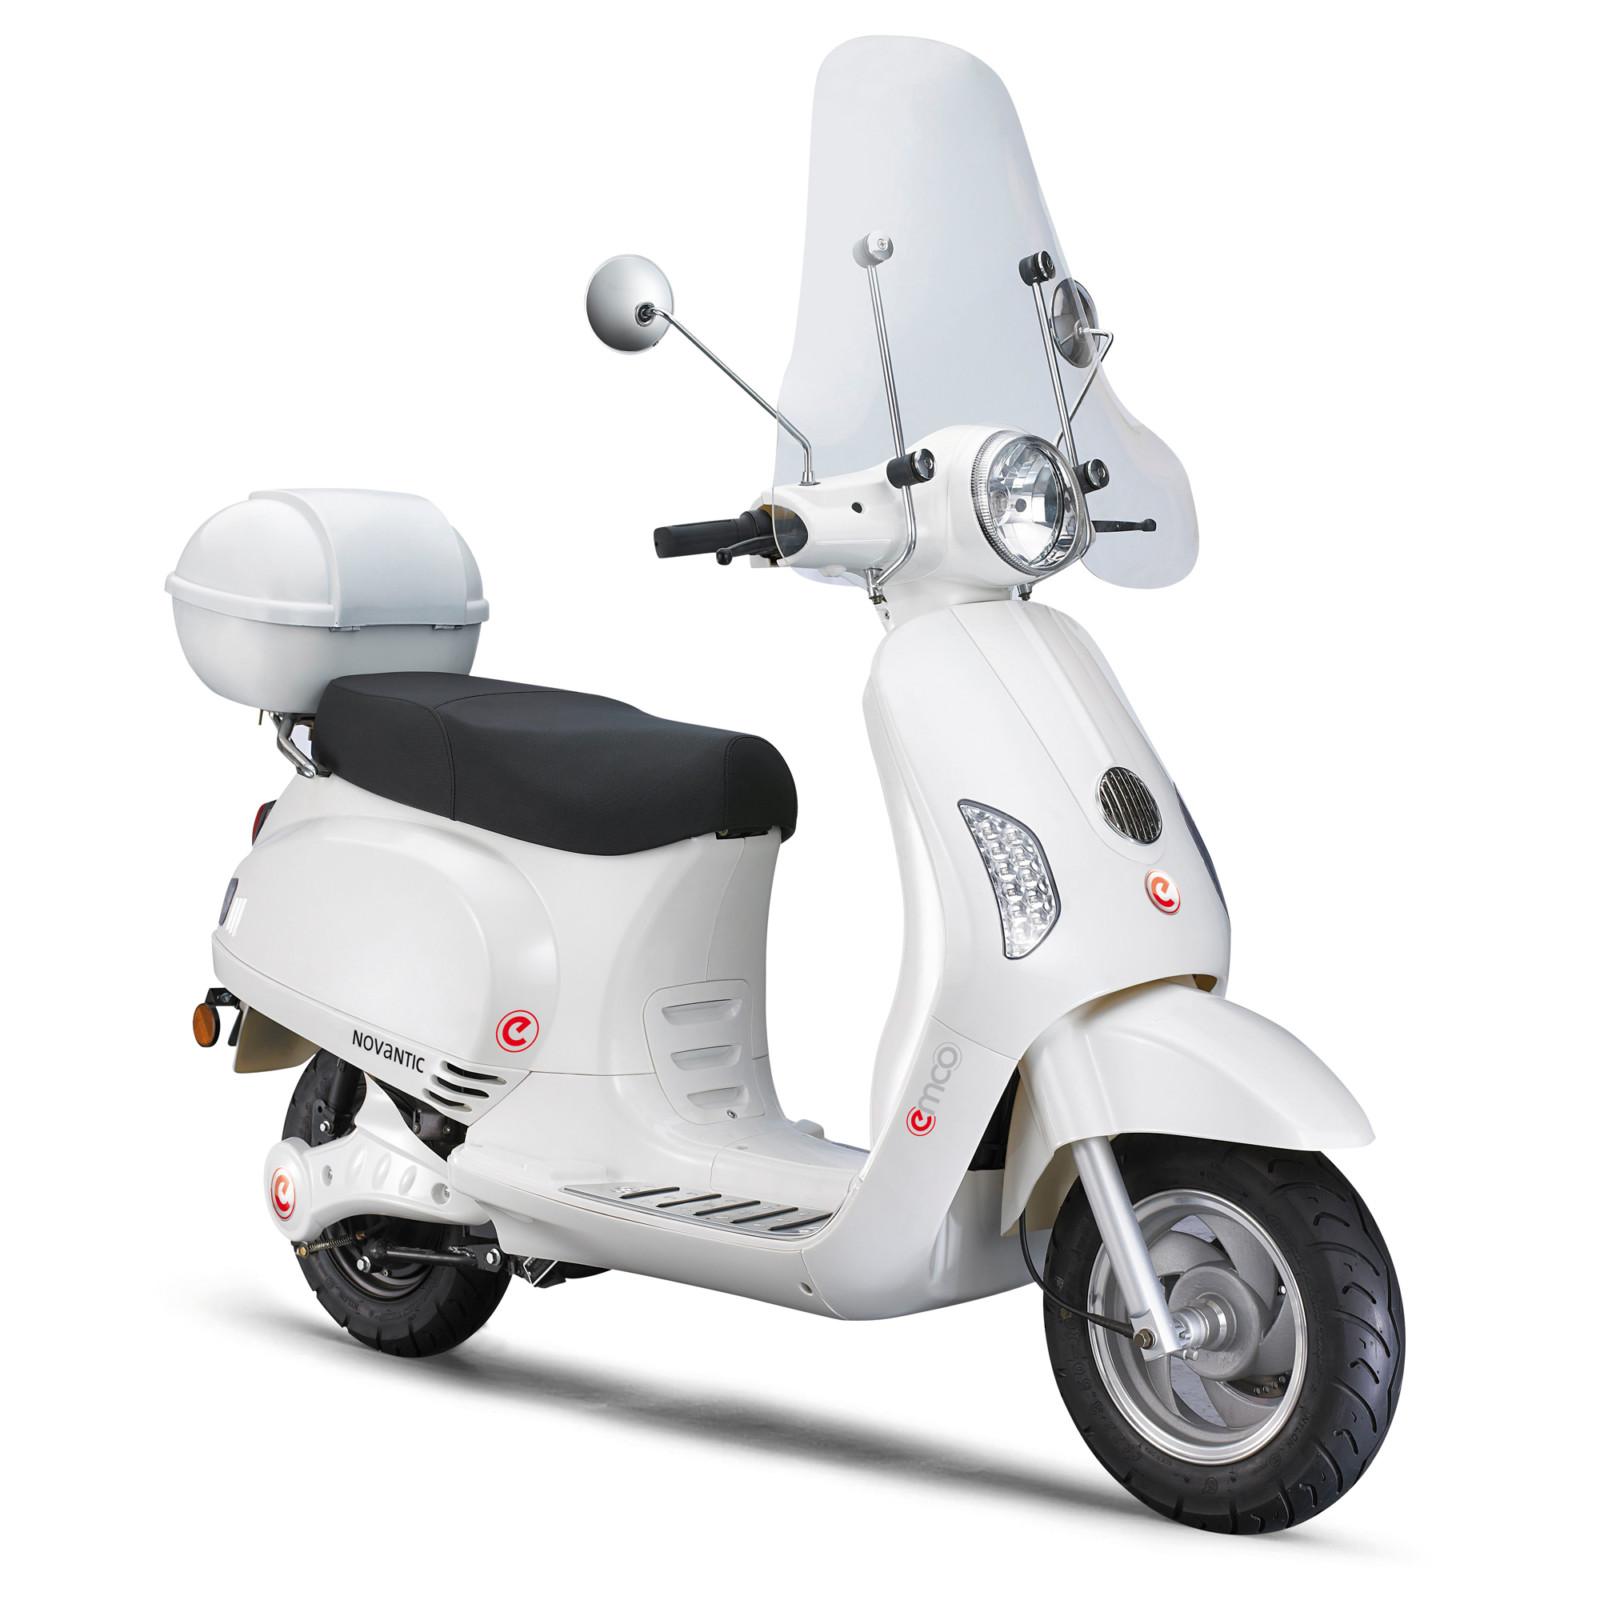 emco novantic c 2000 electric moped scooter 2019. Black Bedroom Furniture Sets. Home Design Ideas